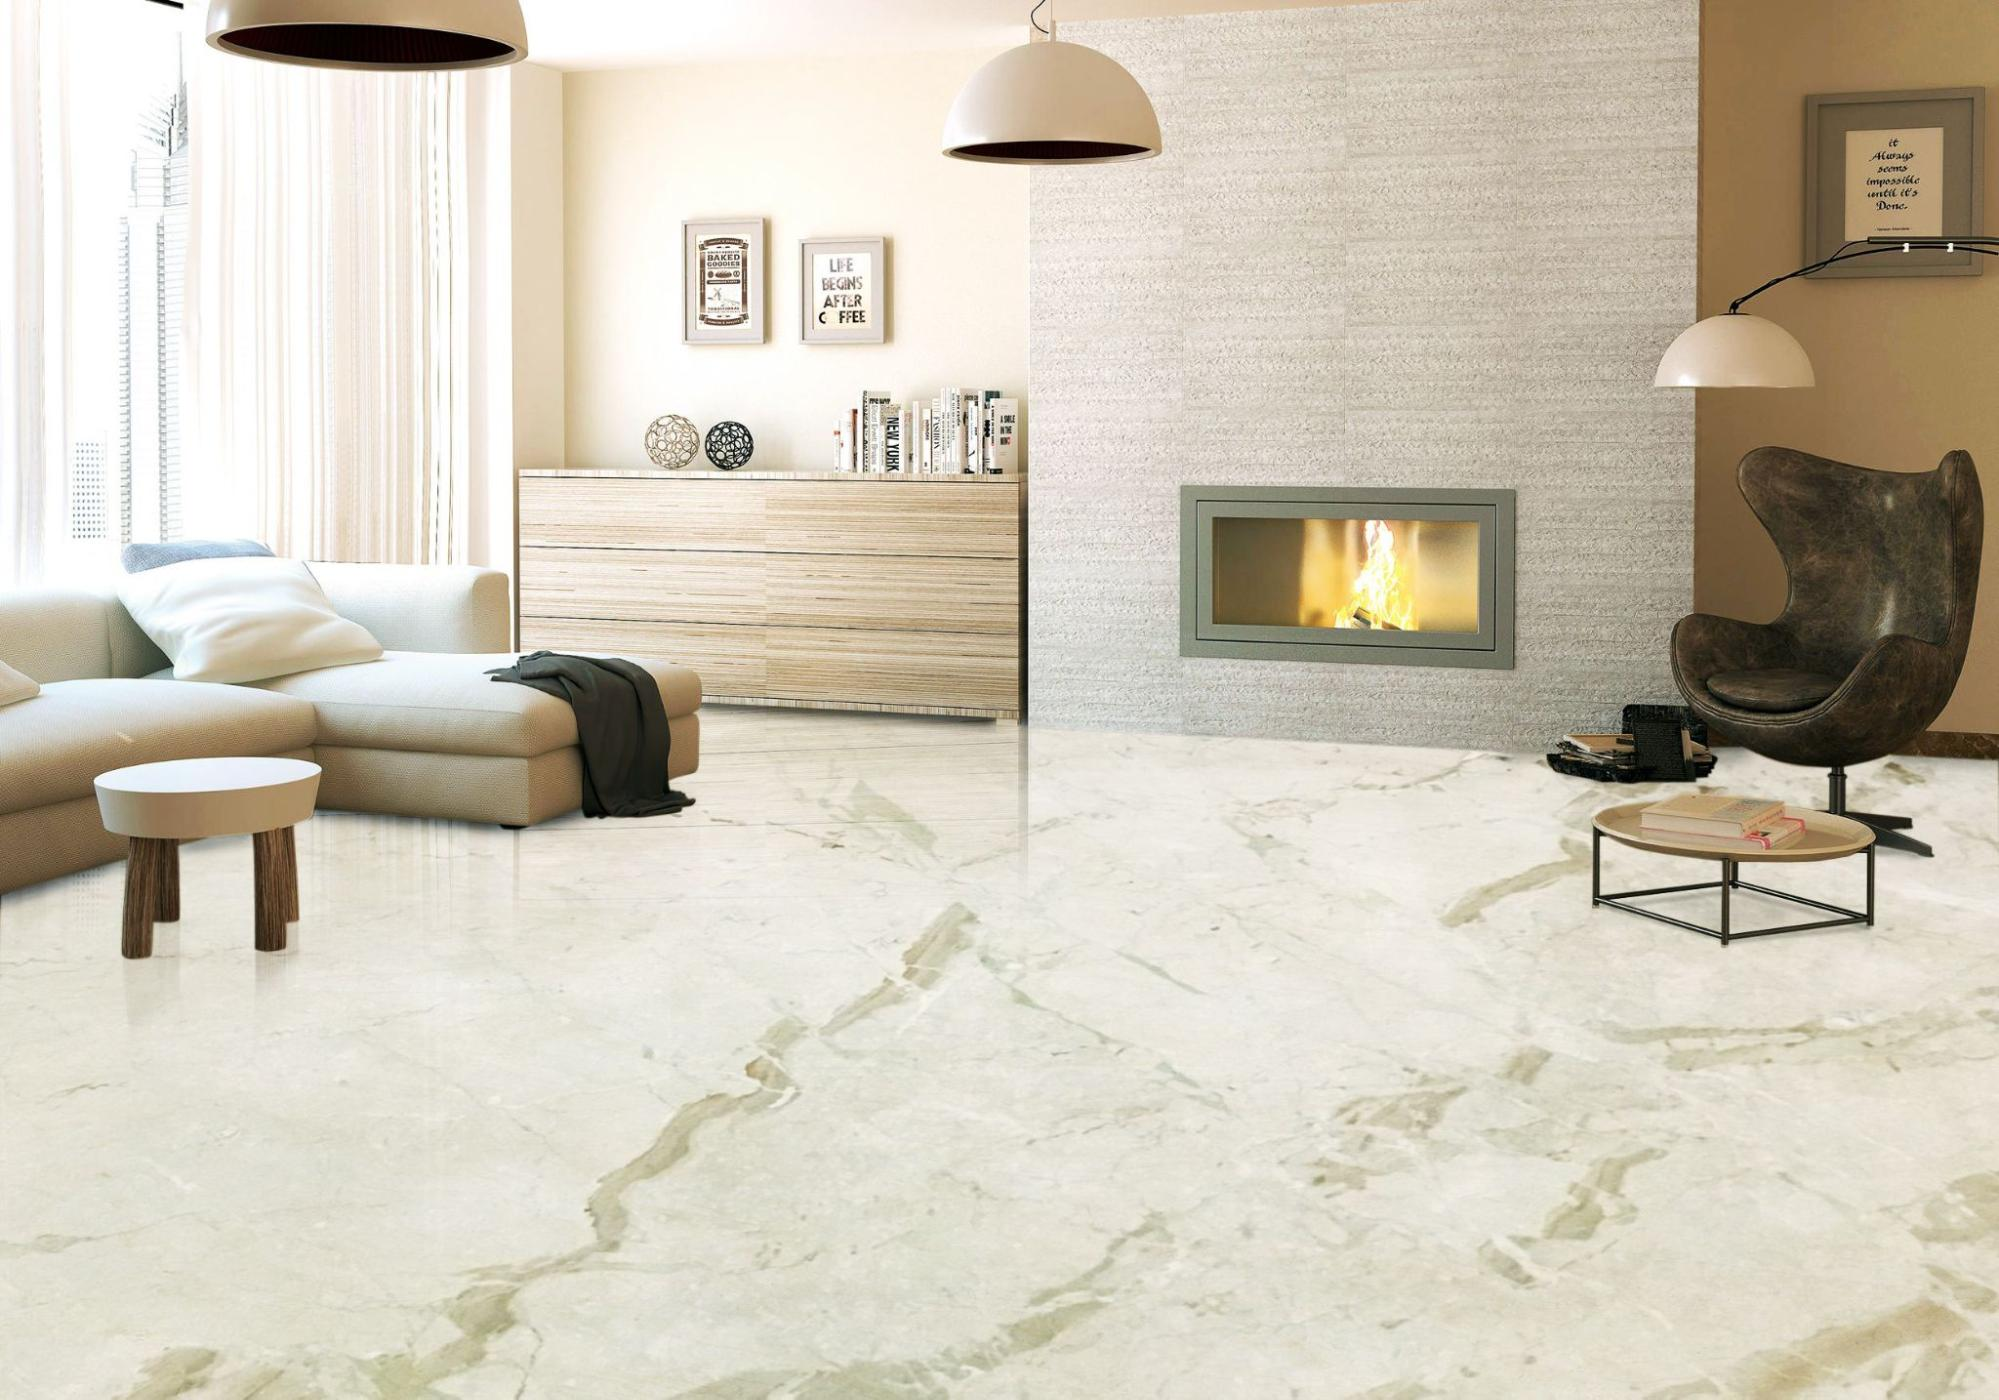 Breccia Marble Tiles On Flooring